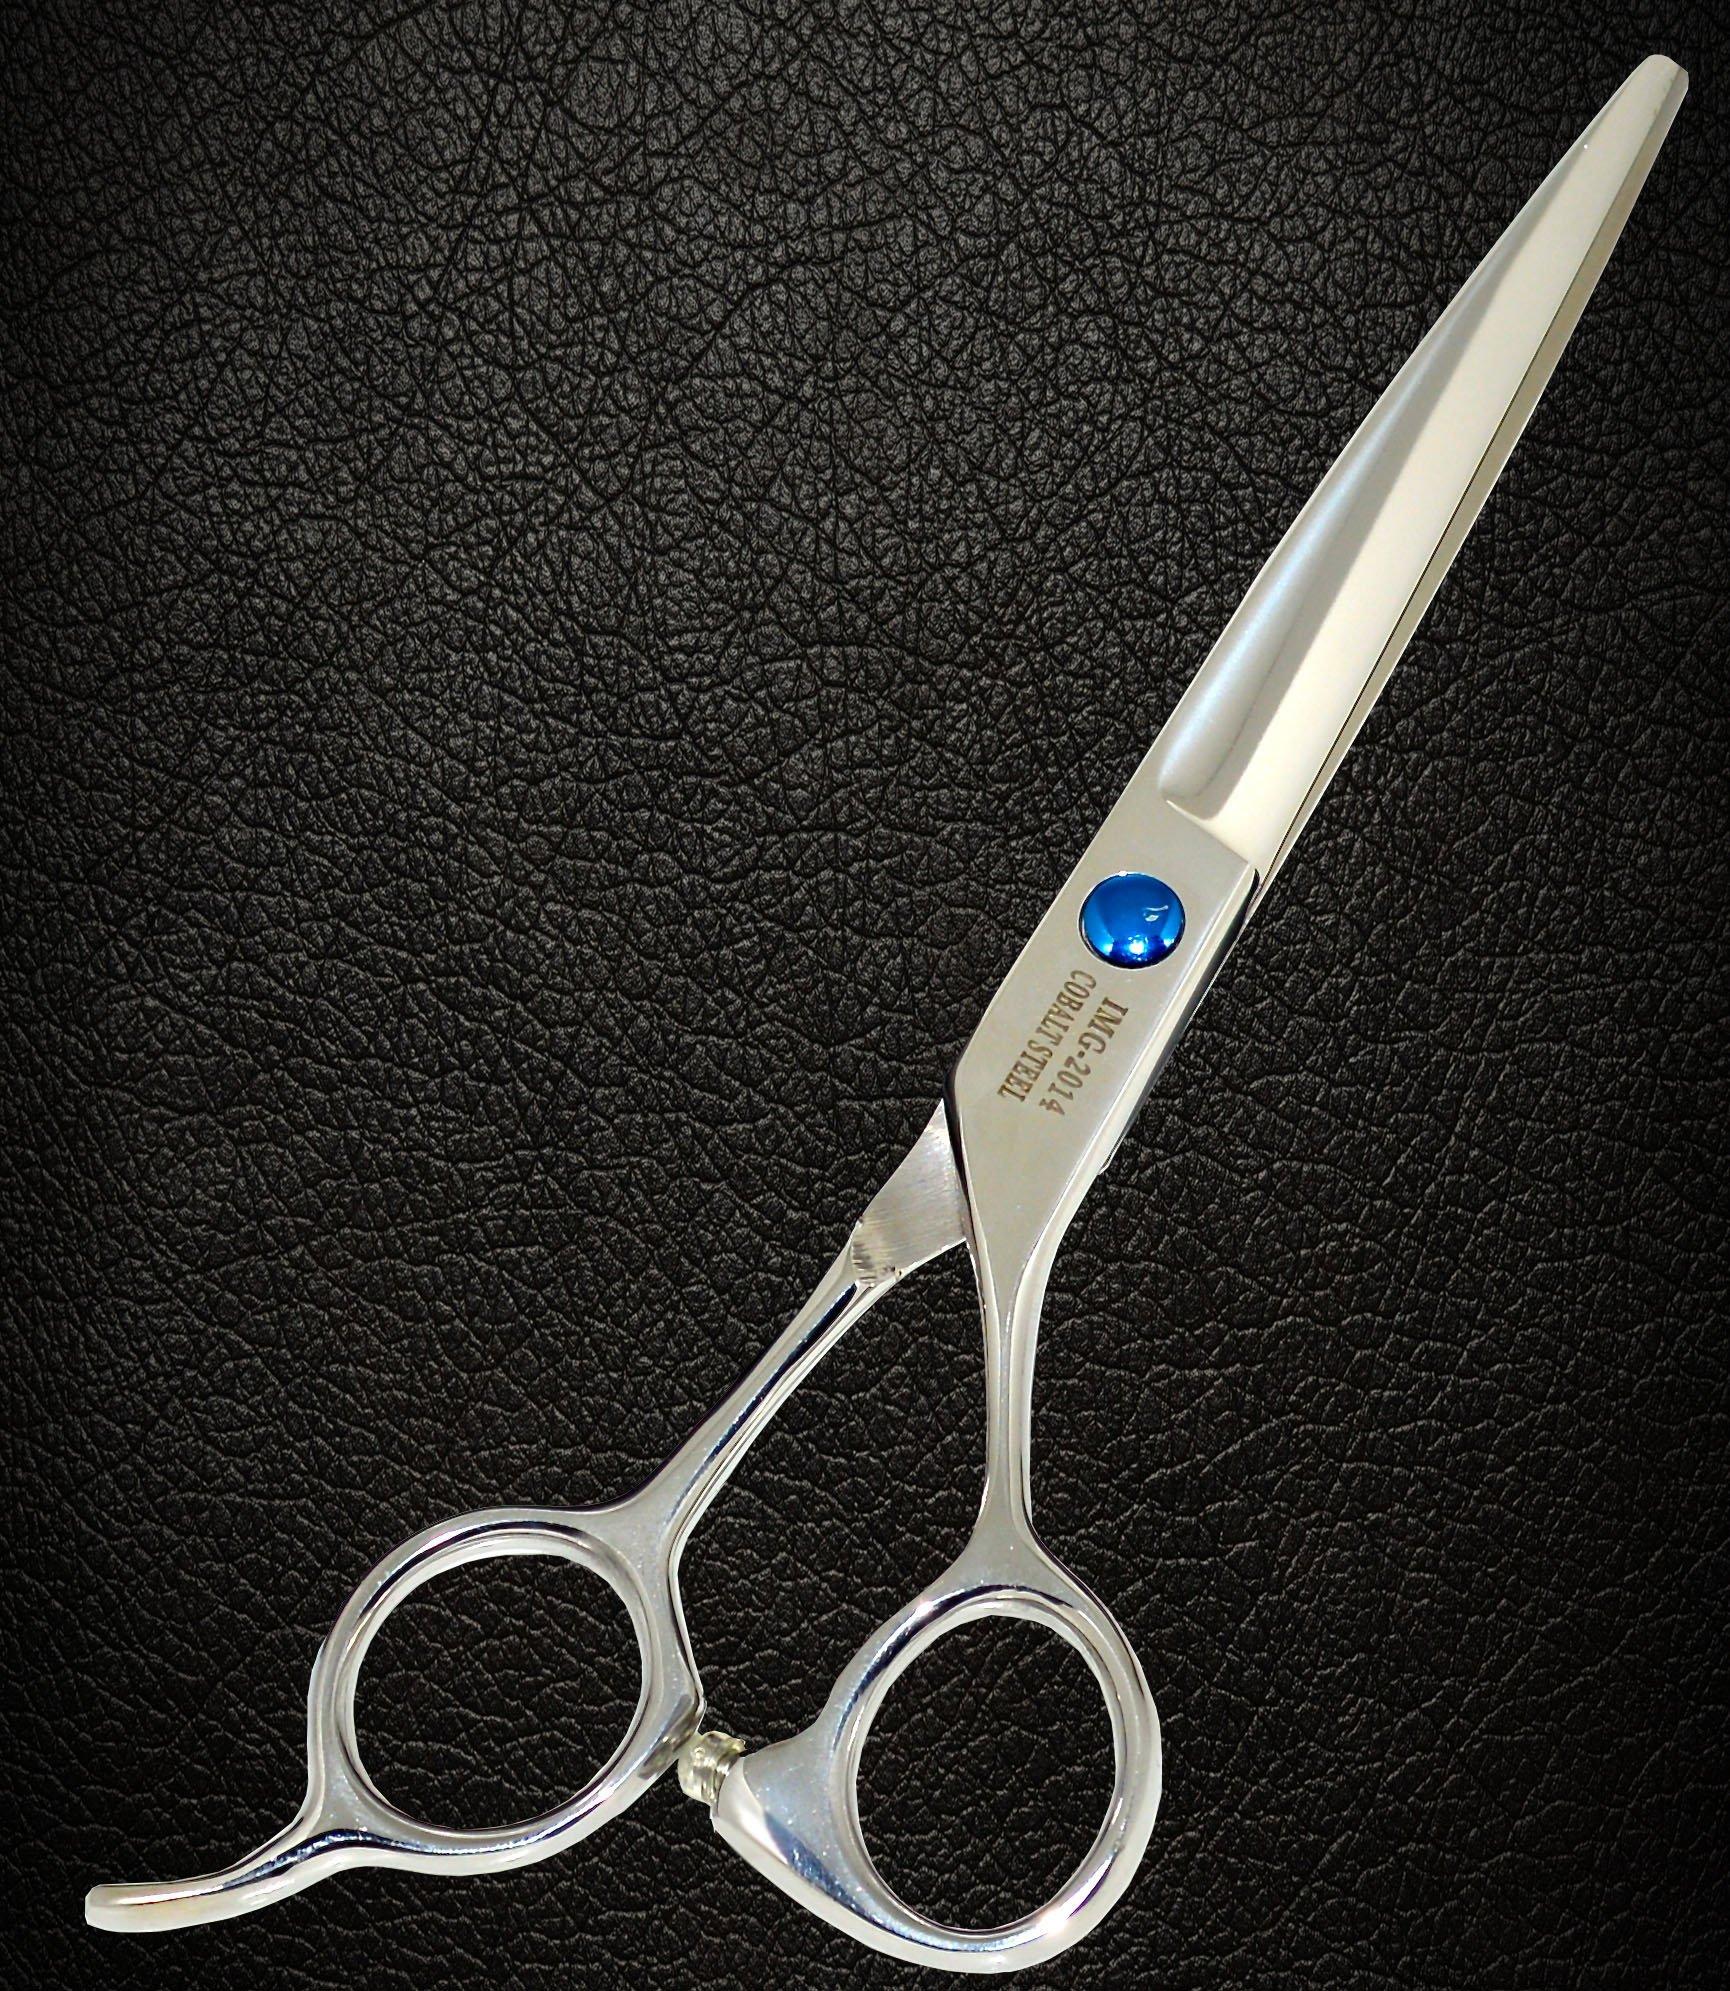 Equinox Professional Razor Edge Series - Barber Hair Cutting Scissors/Shears - 6.5'' Overall Length - Beautiful White Diamond Stones with Blue Chromium Fine Adjustment Tension Screw by Equinox International (Image #6)